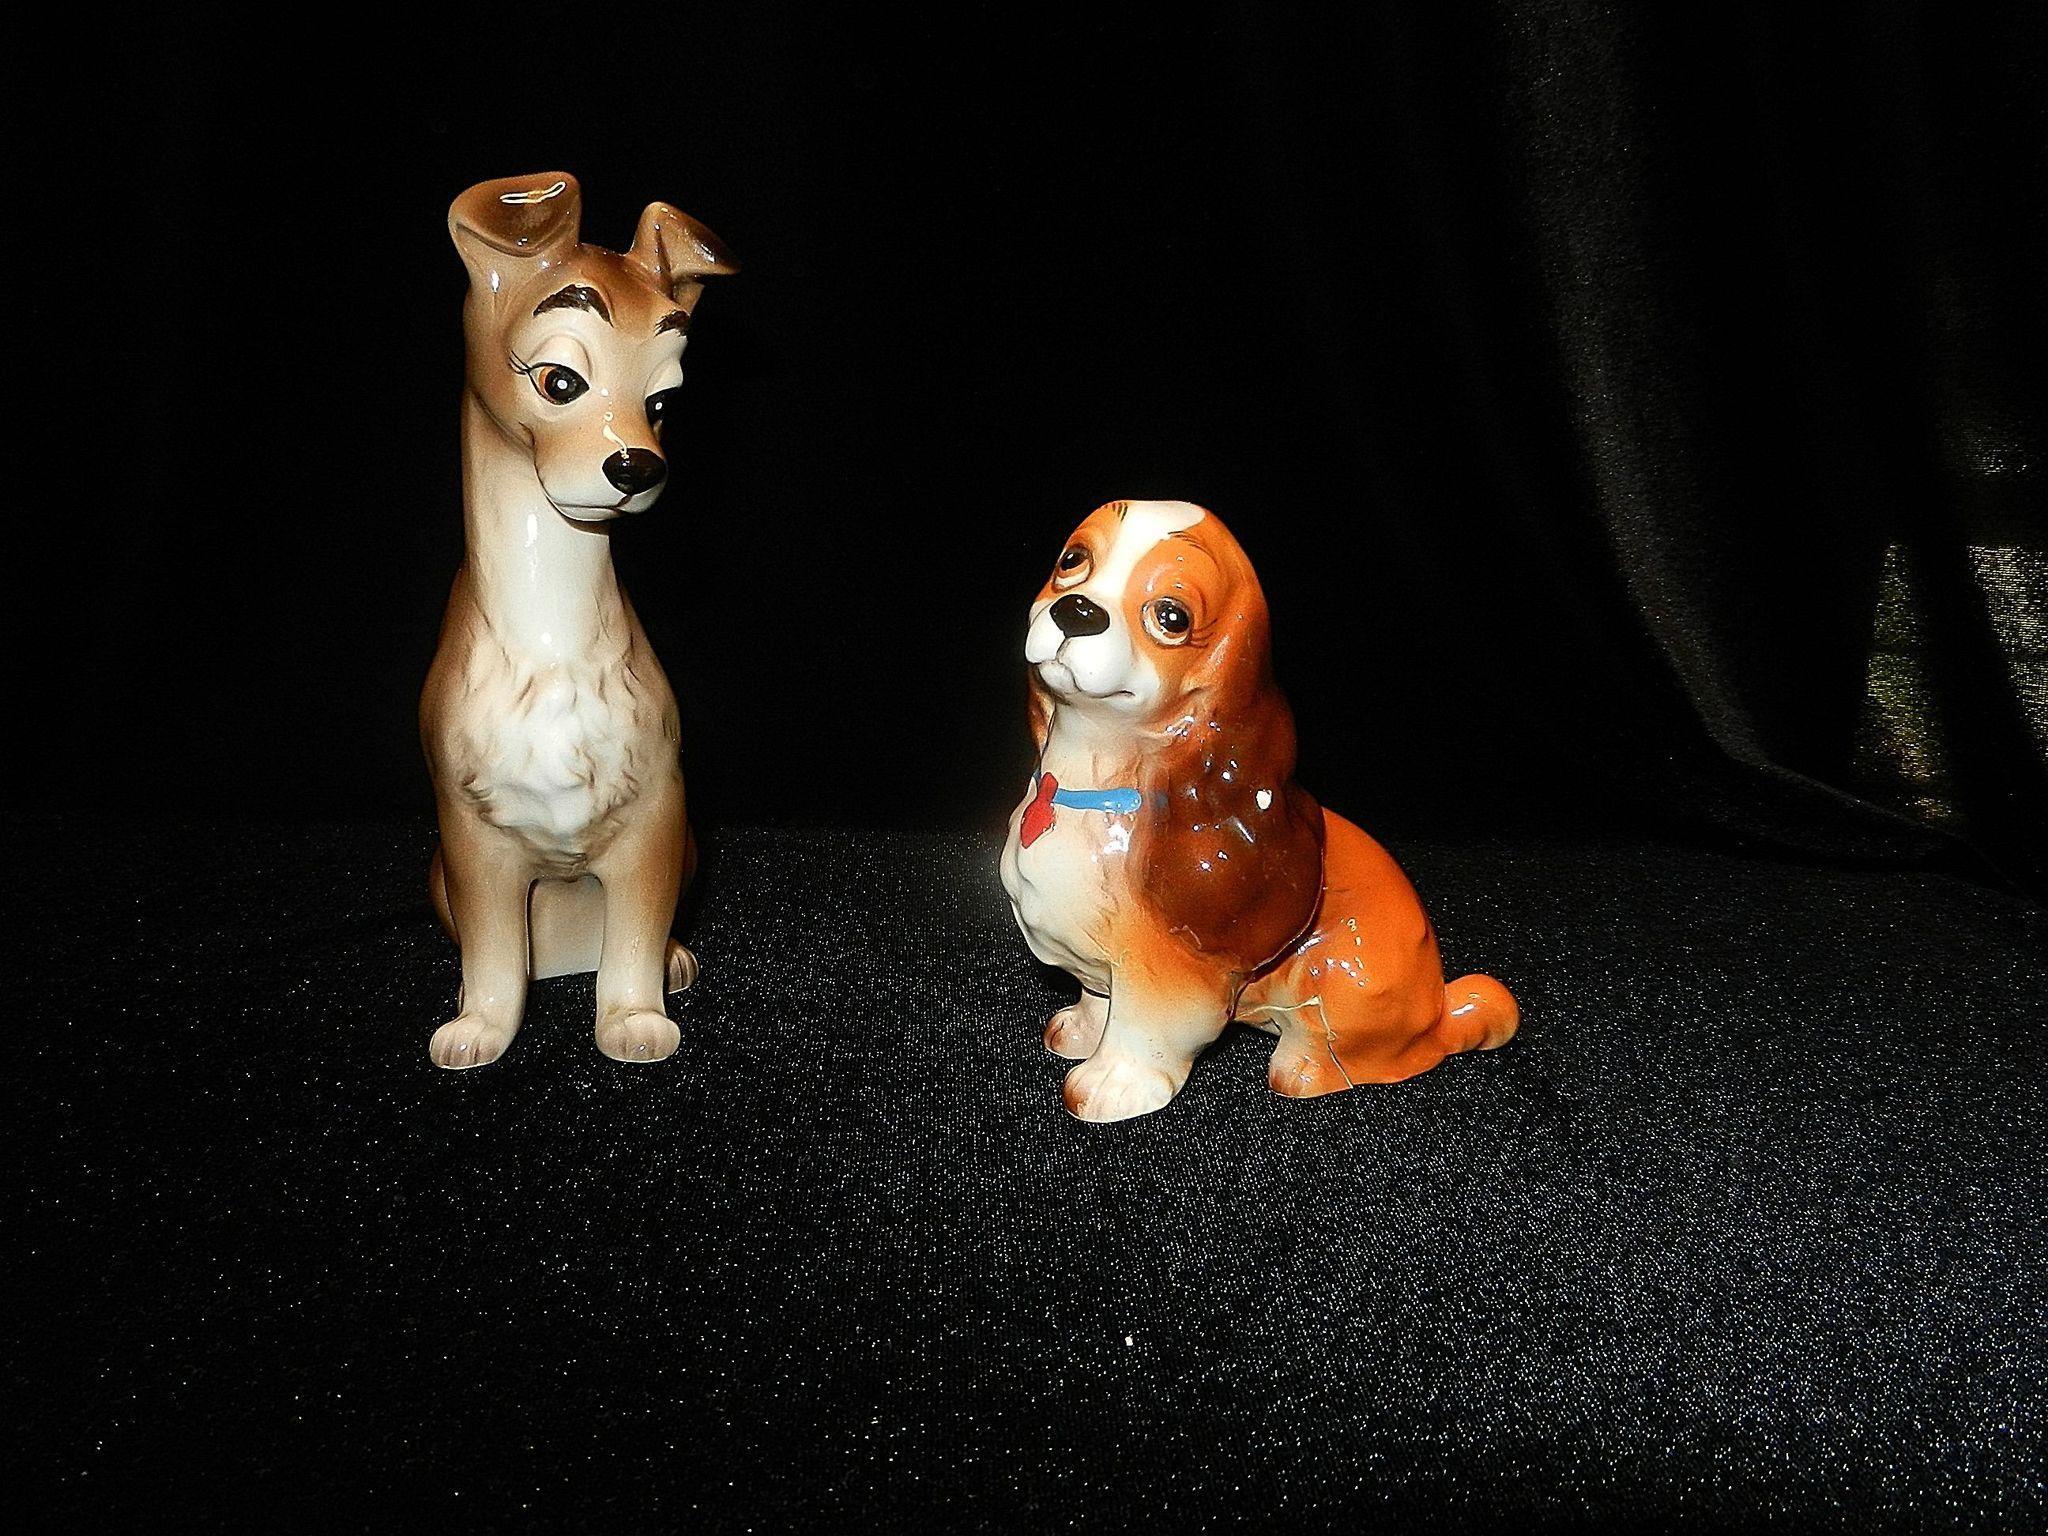 Vintage Ceramic Walt Disney Lady And The Tramp Dog Figurines Dog Figurines Animal Figurines Vintage Ceramic